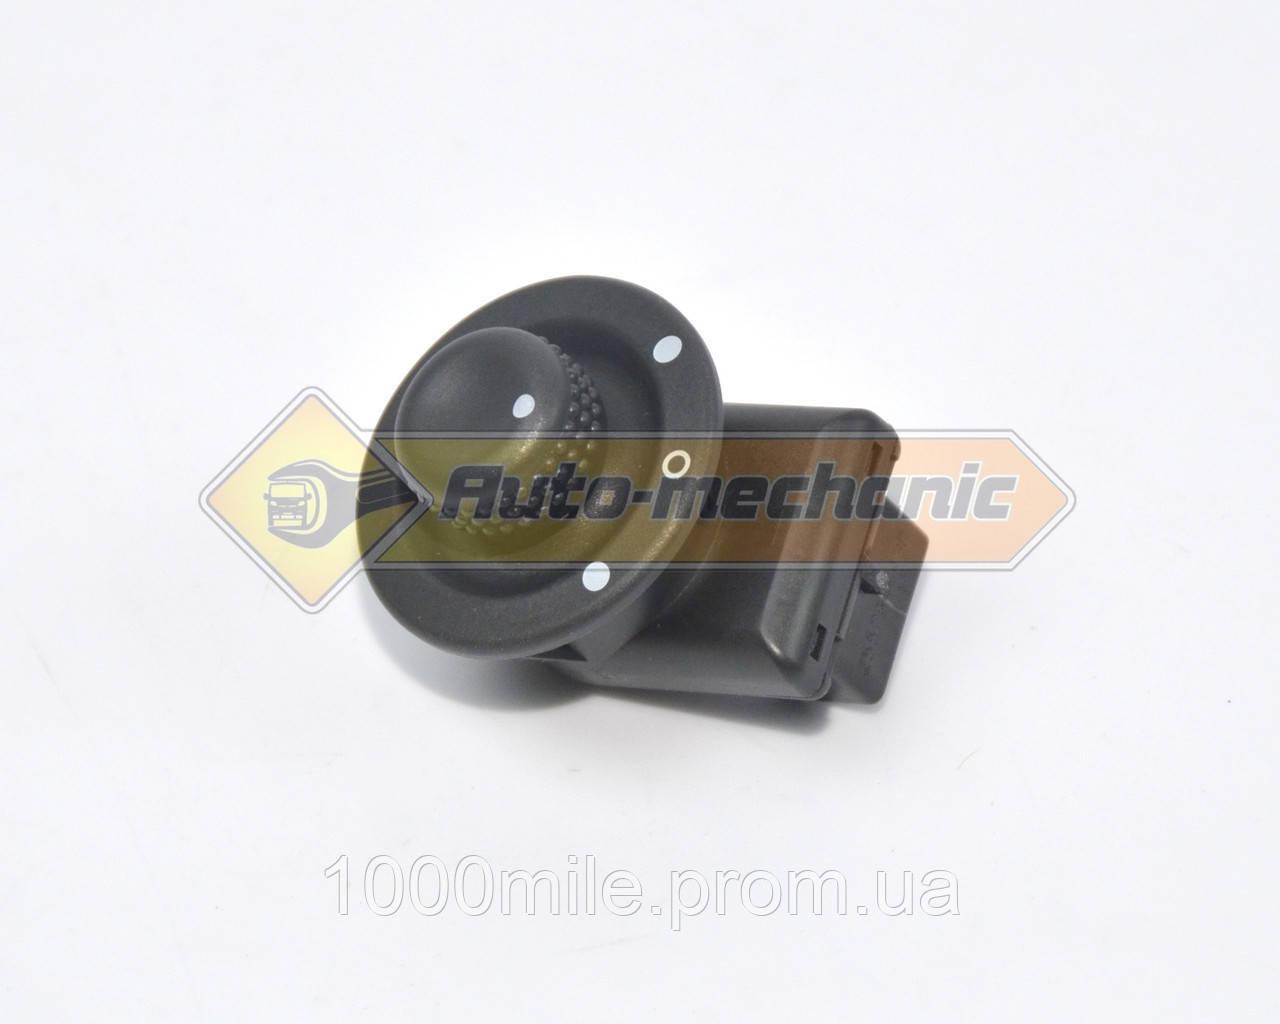 Ручка управления электро-зеркалами (джойстик) на  Renault Kangoo II 2012-> — Renault (Оригинал) - 255704649R